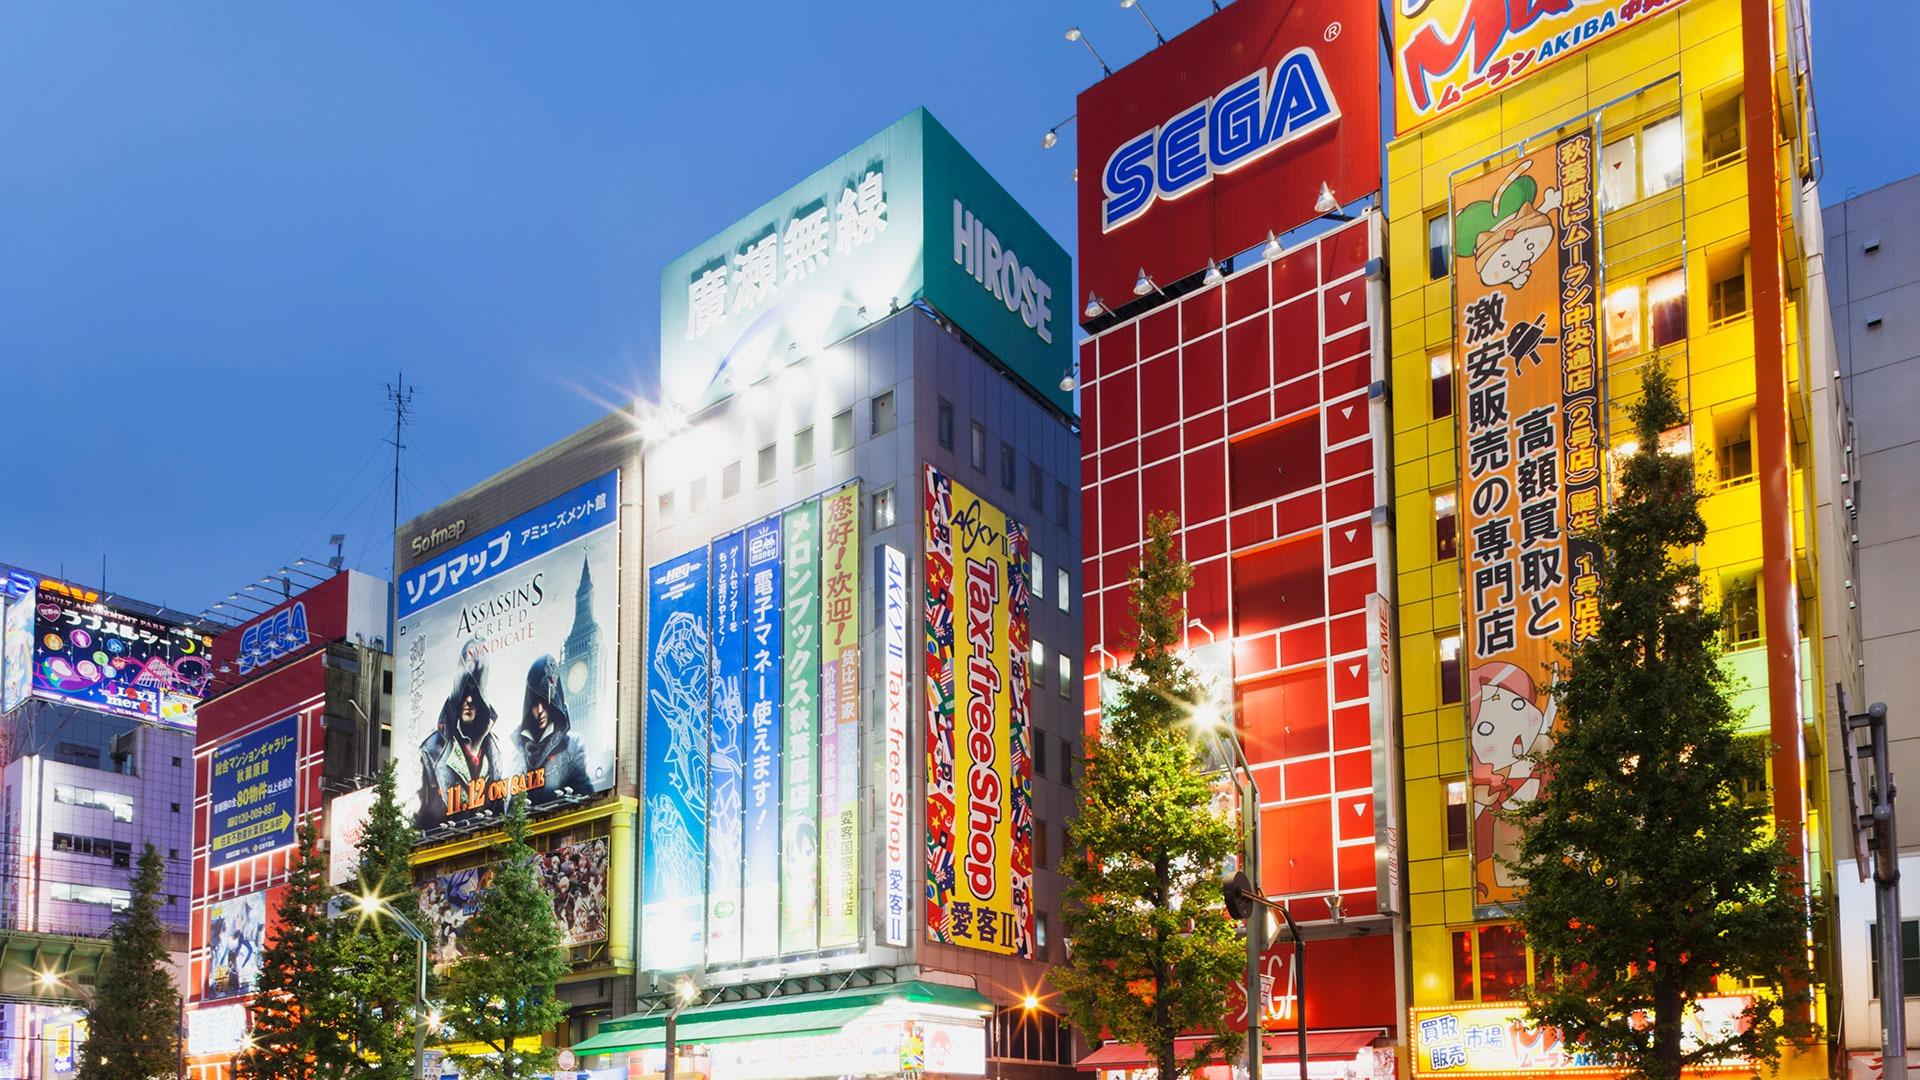 Street scene in Akihabara, Tokyo, Japan